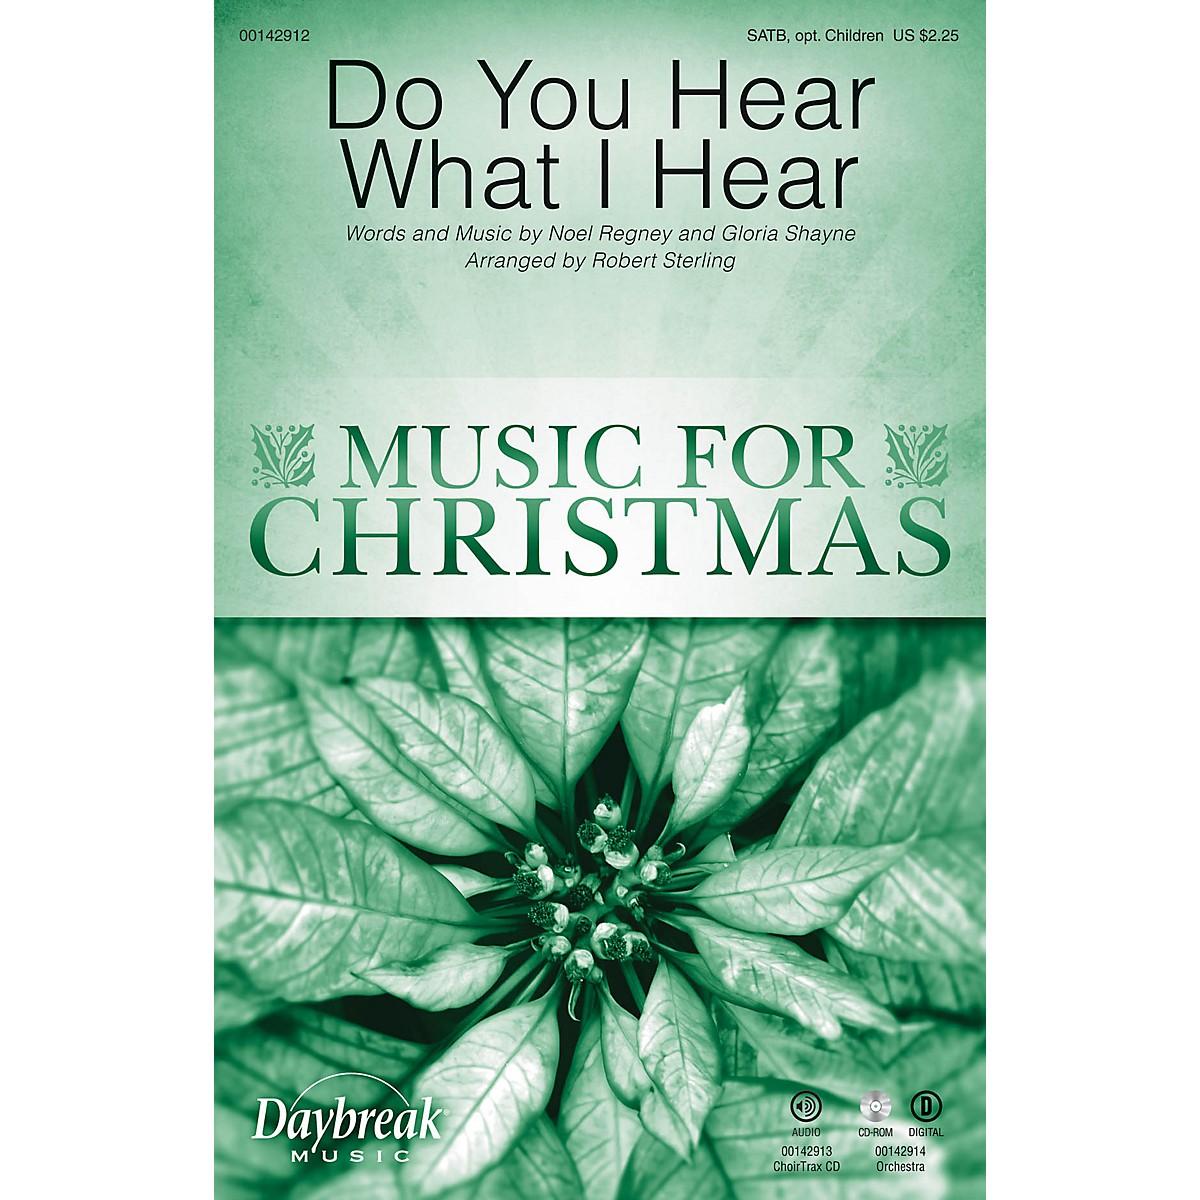 Daybreak Music Do You Hear What I Hear CHOIRTRAX CD Arranged by Robert Sterling